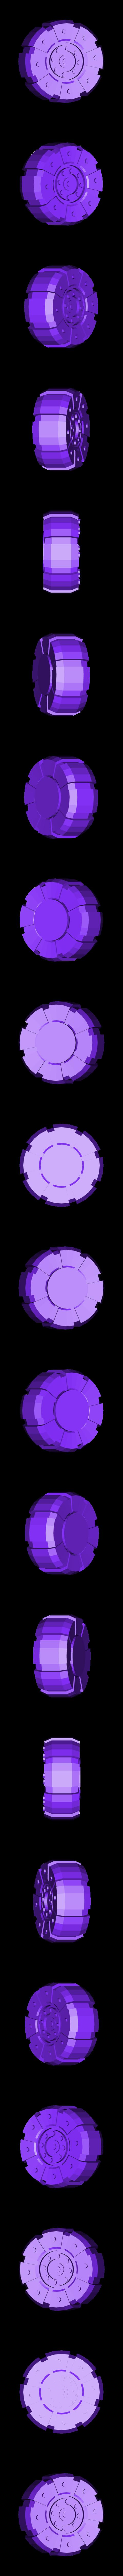 wheel.stl Download free STL file KustomWagon (blown apart) • 3D printable object, Savex